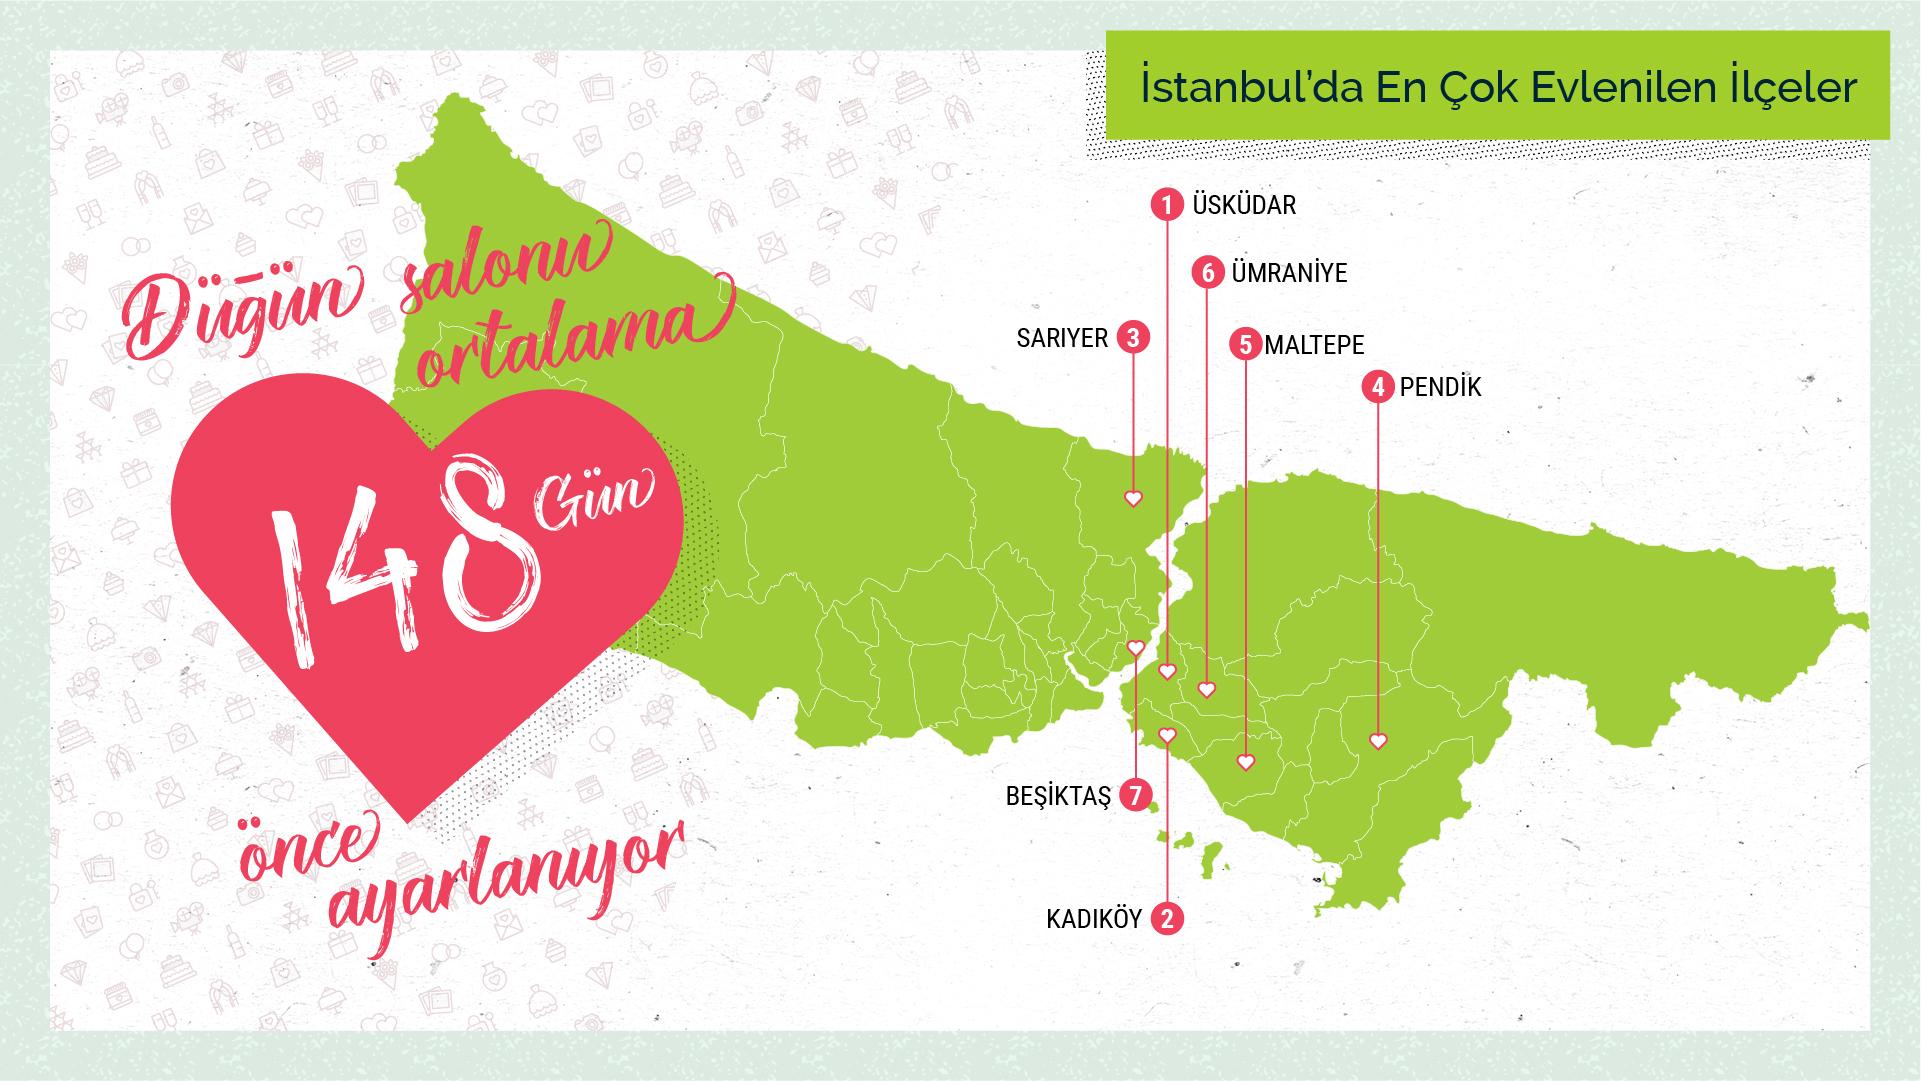 İstanbulda_En_Cok_Evlenilen_İlceler